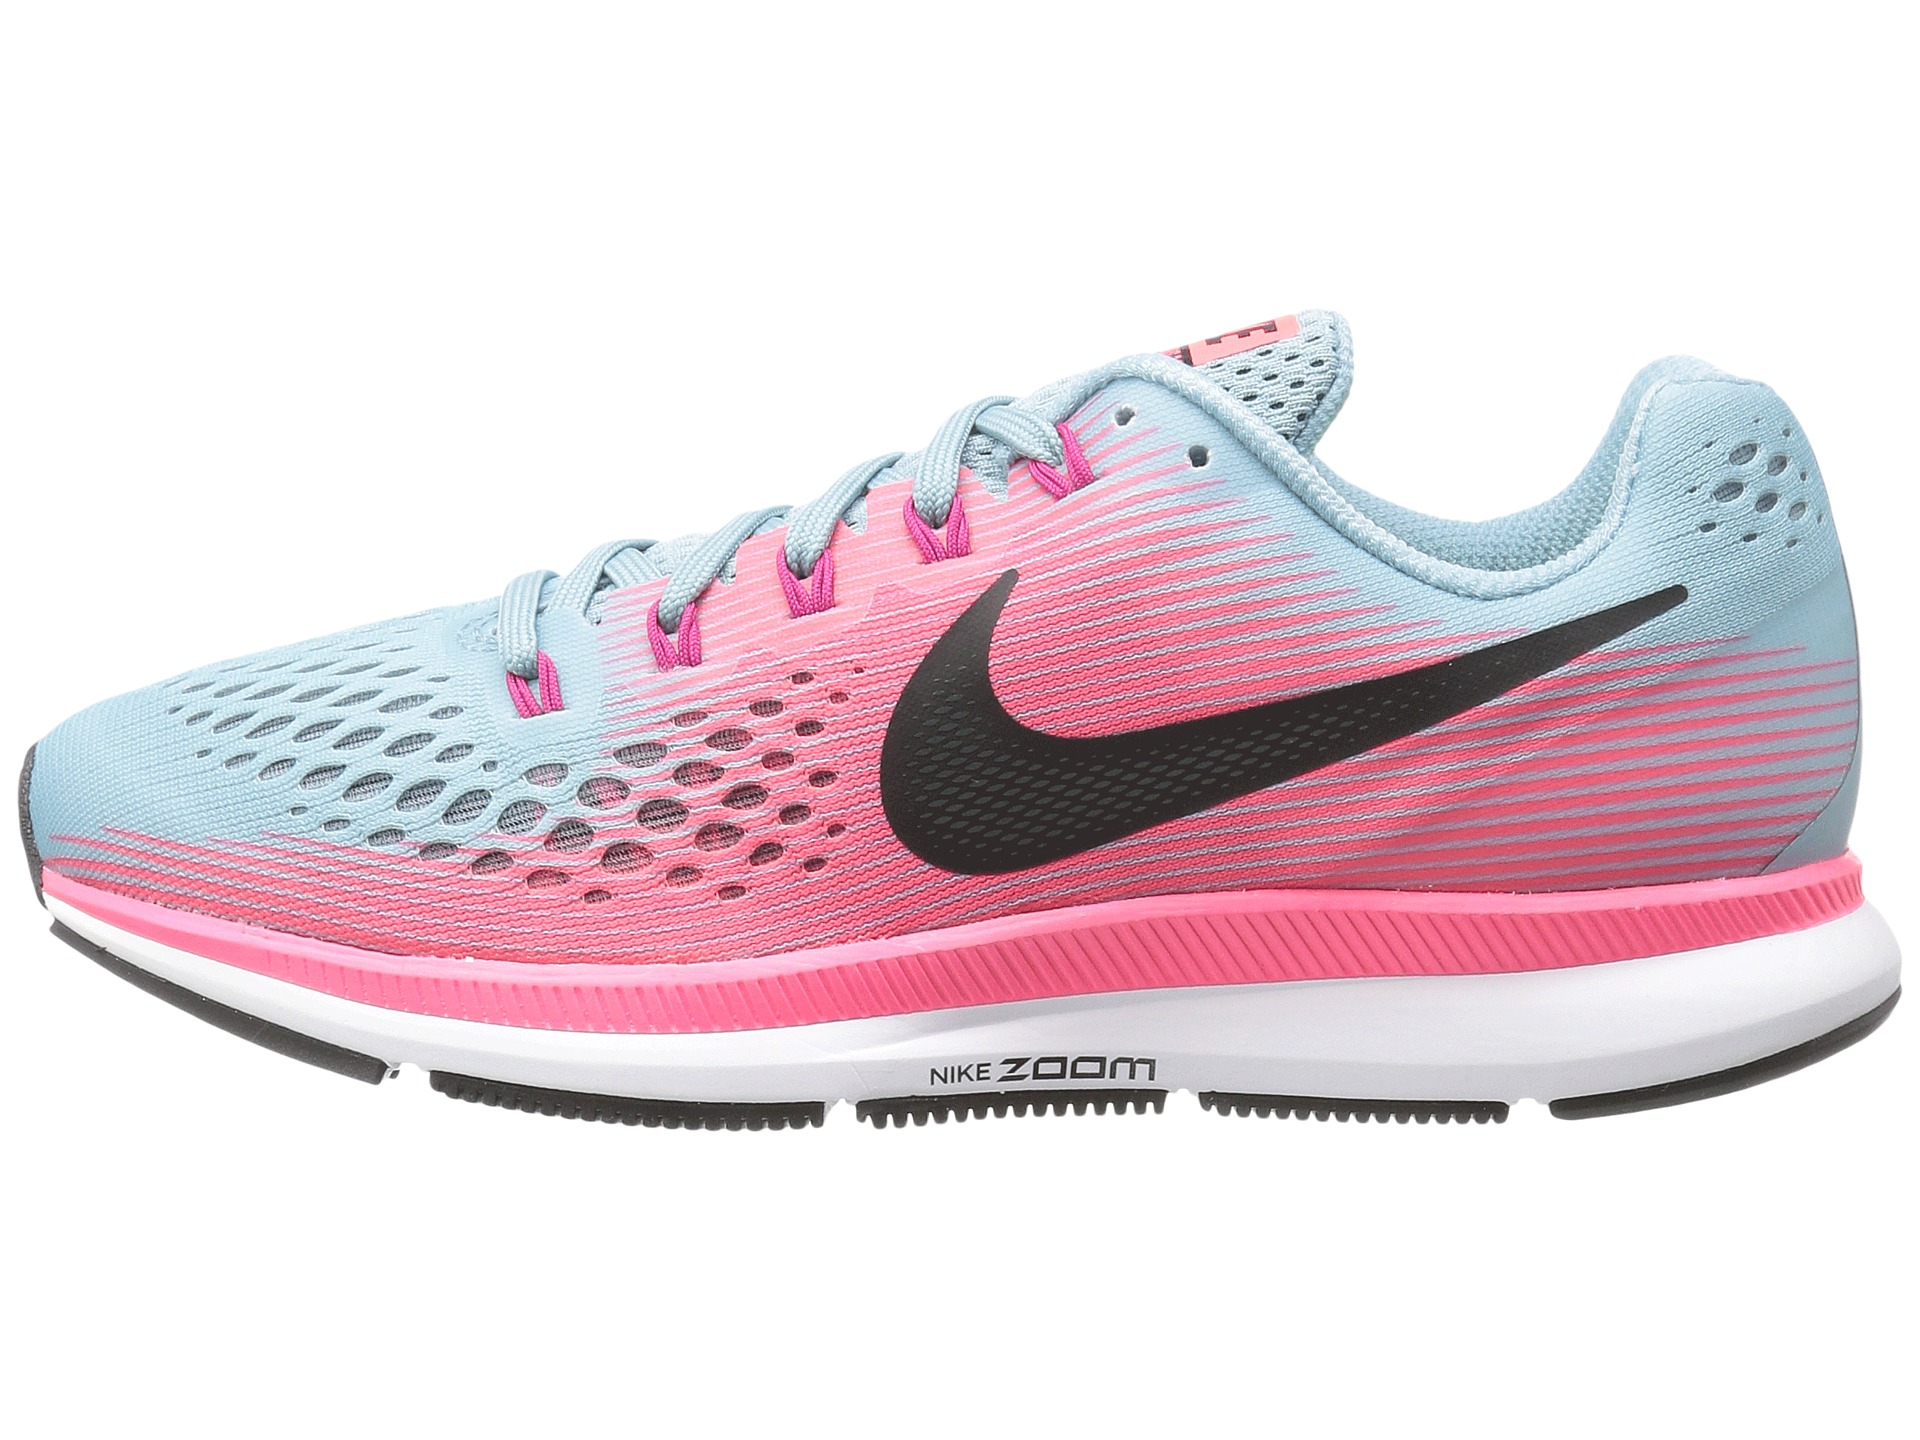 304ea71fbedb Silver Nike Dunk Sb Pro Online